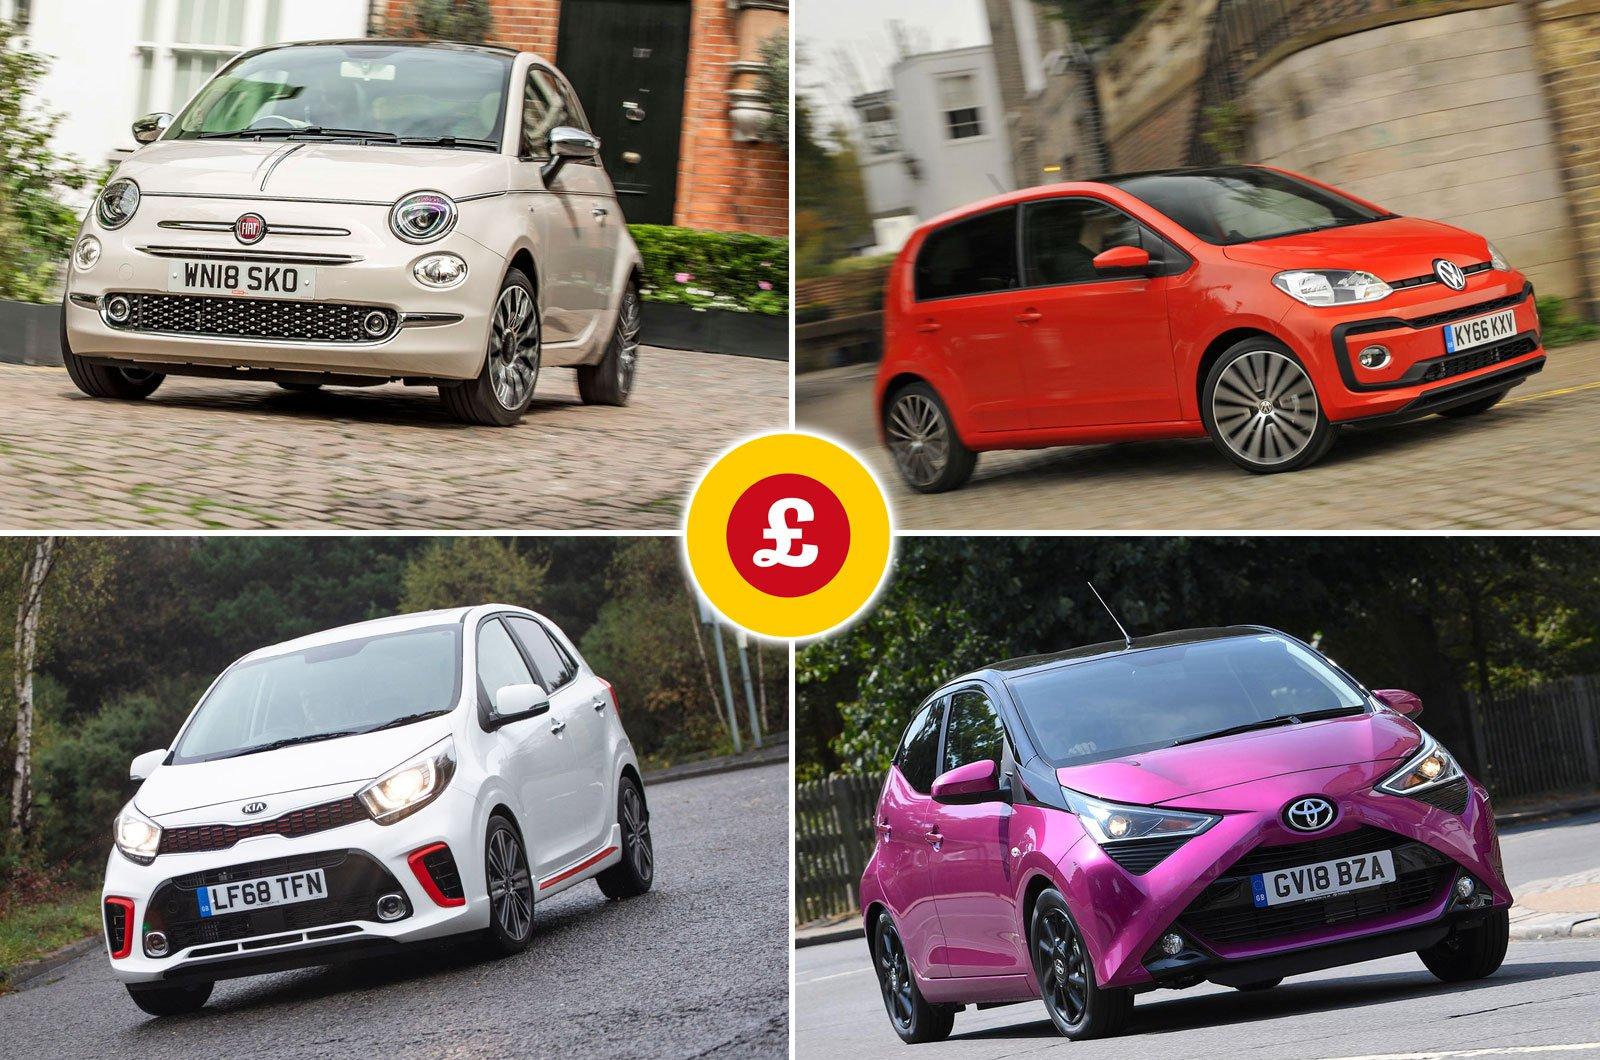 Fiat 500, Volkswagen Up, Toyota Aygo, Kia Picanto